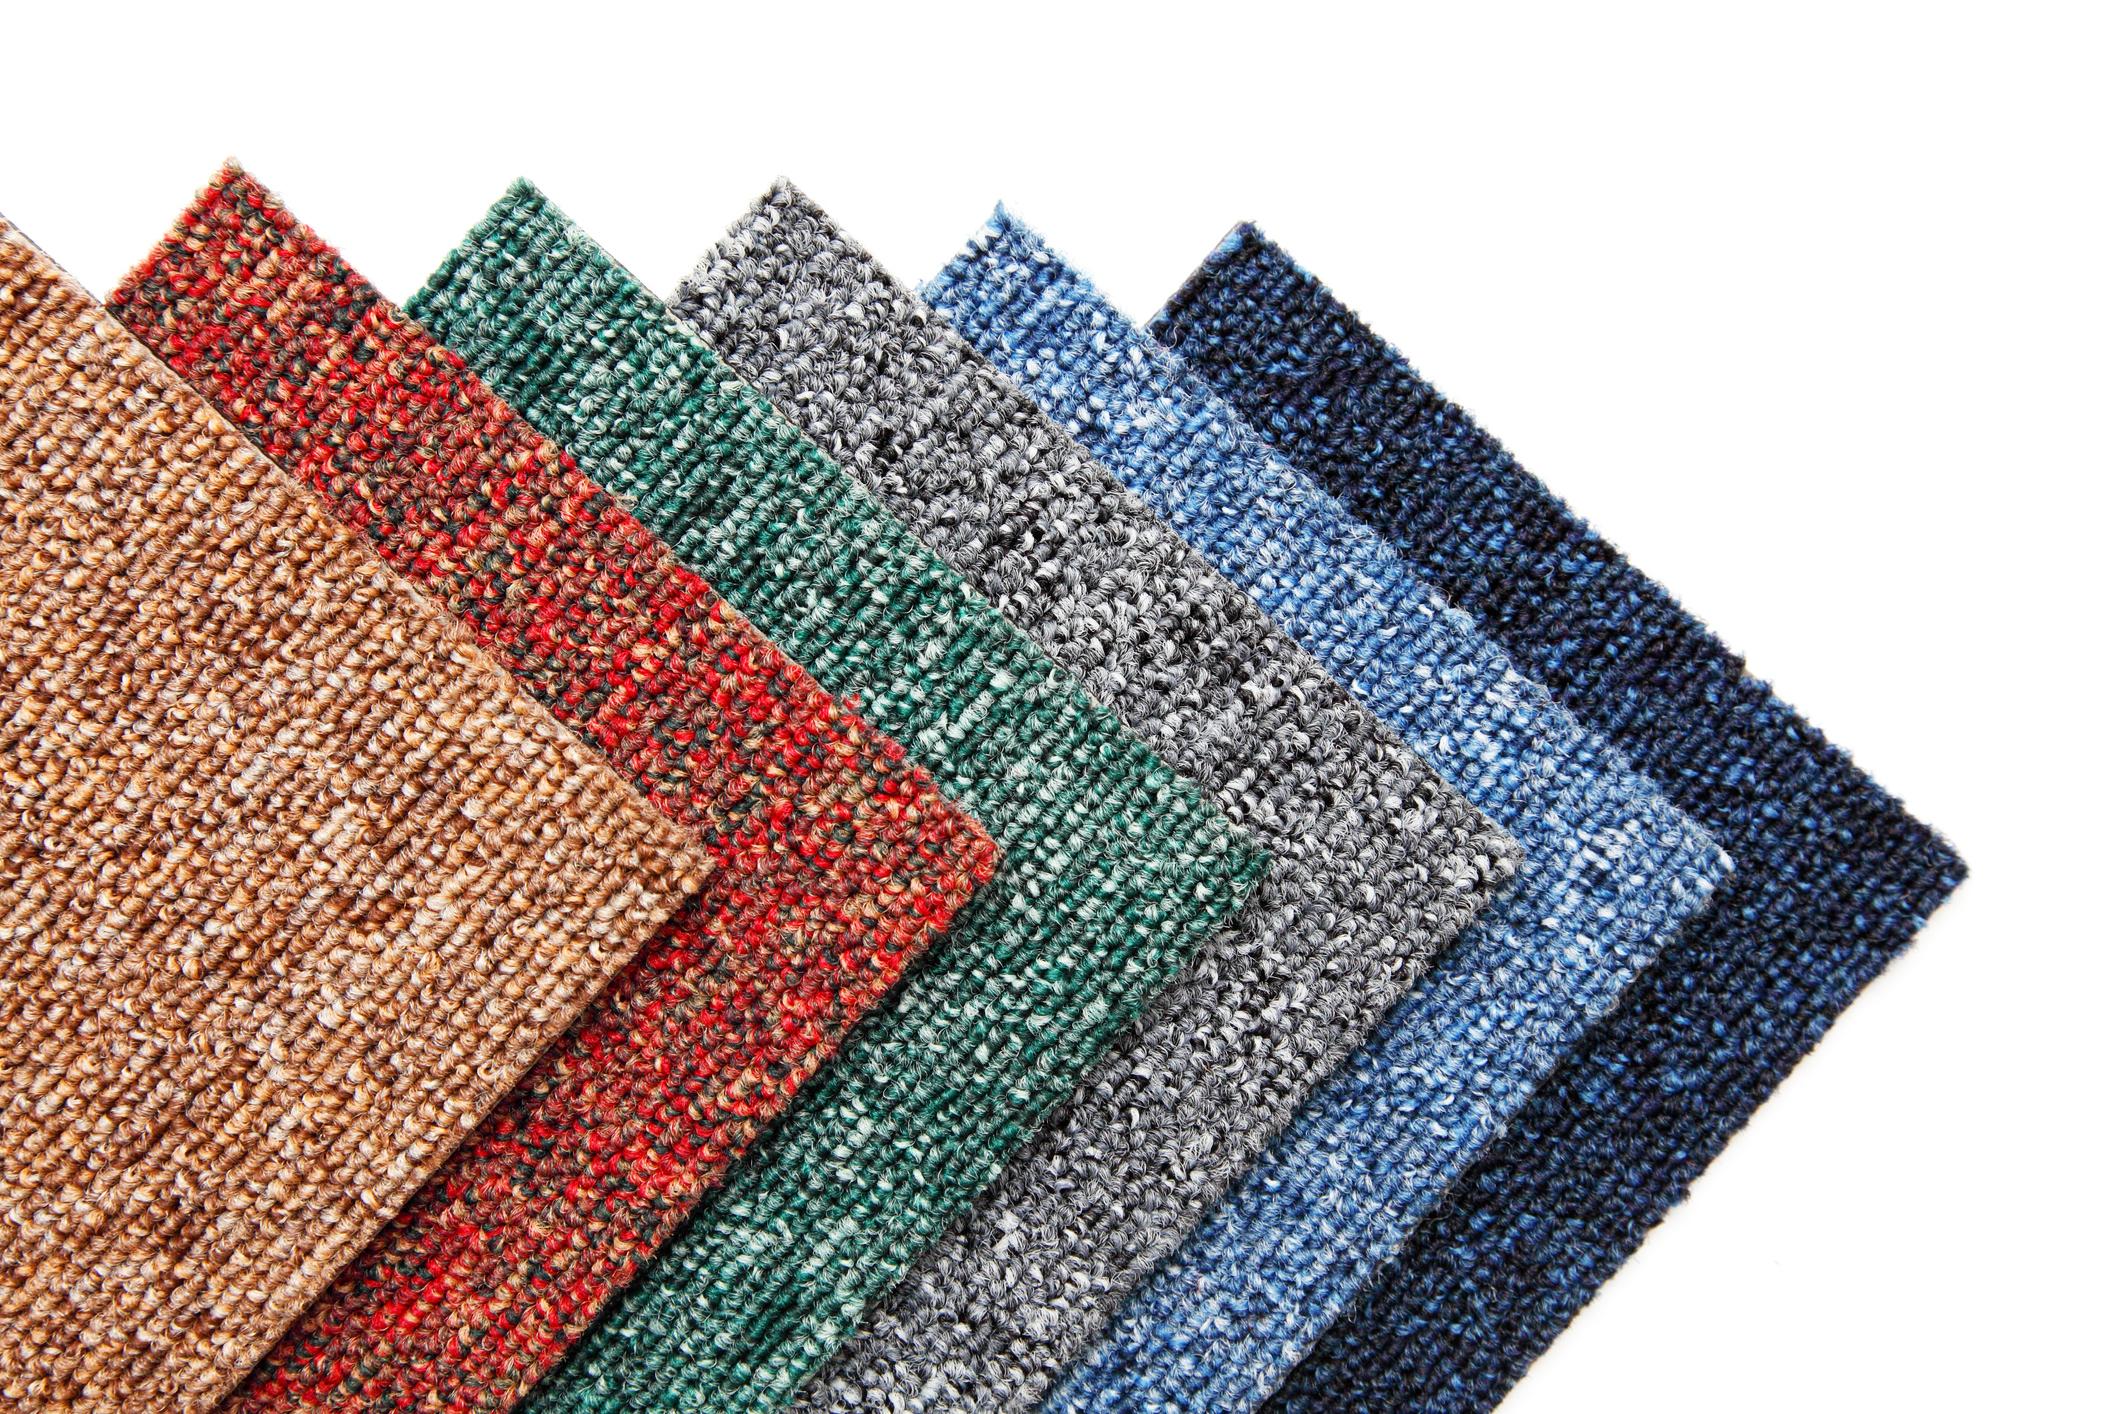 Multicolored carpet tiles.